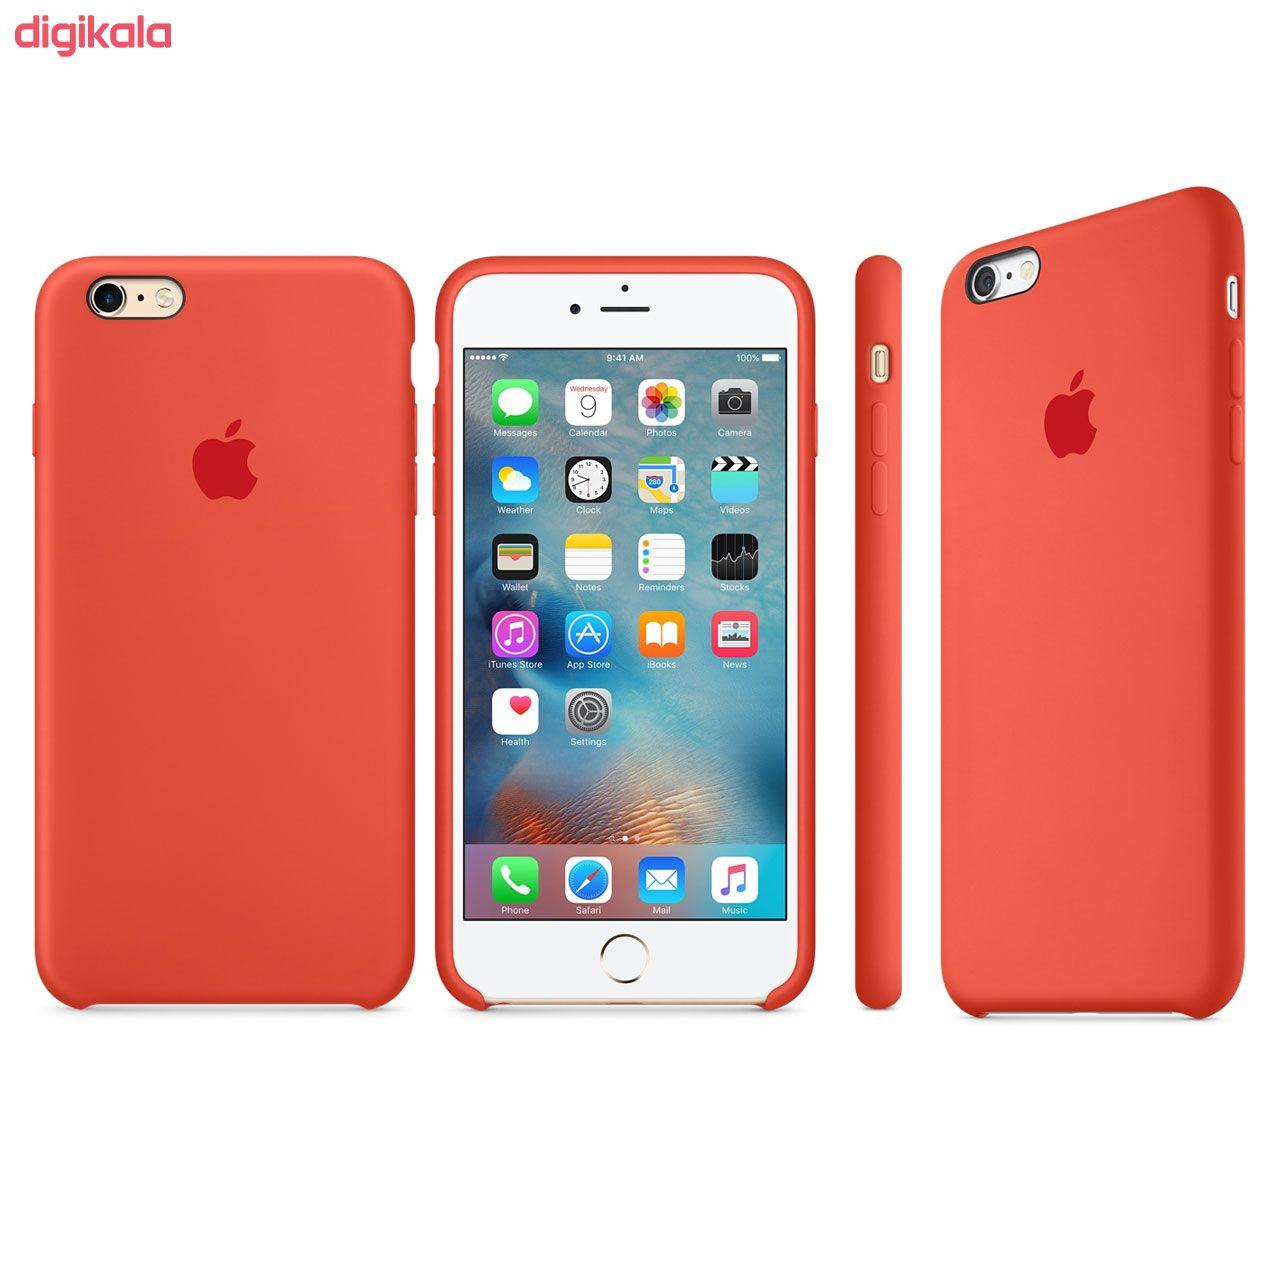 کاور مدل SLCN مناسب برای گوشی موبایل اپل iPhone 7 main 1 7